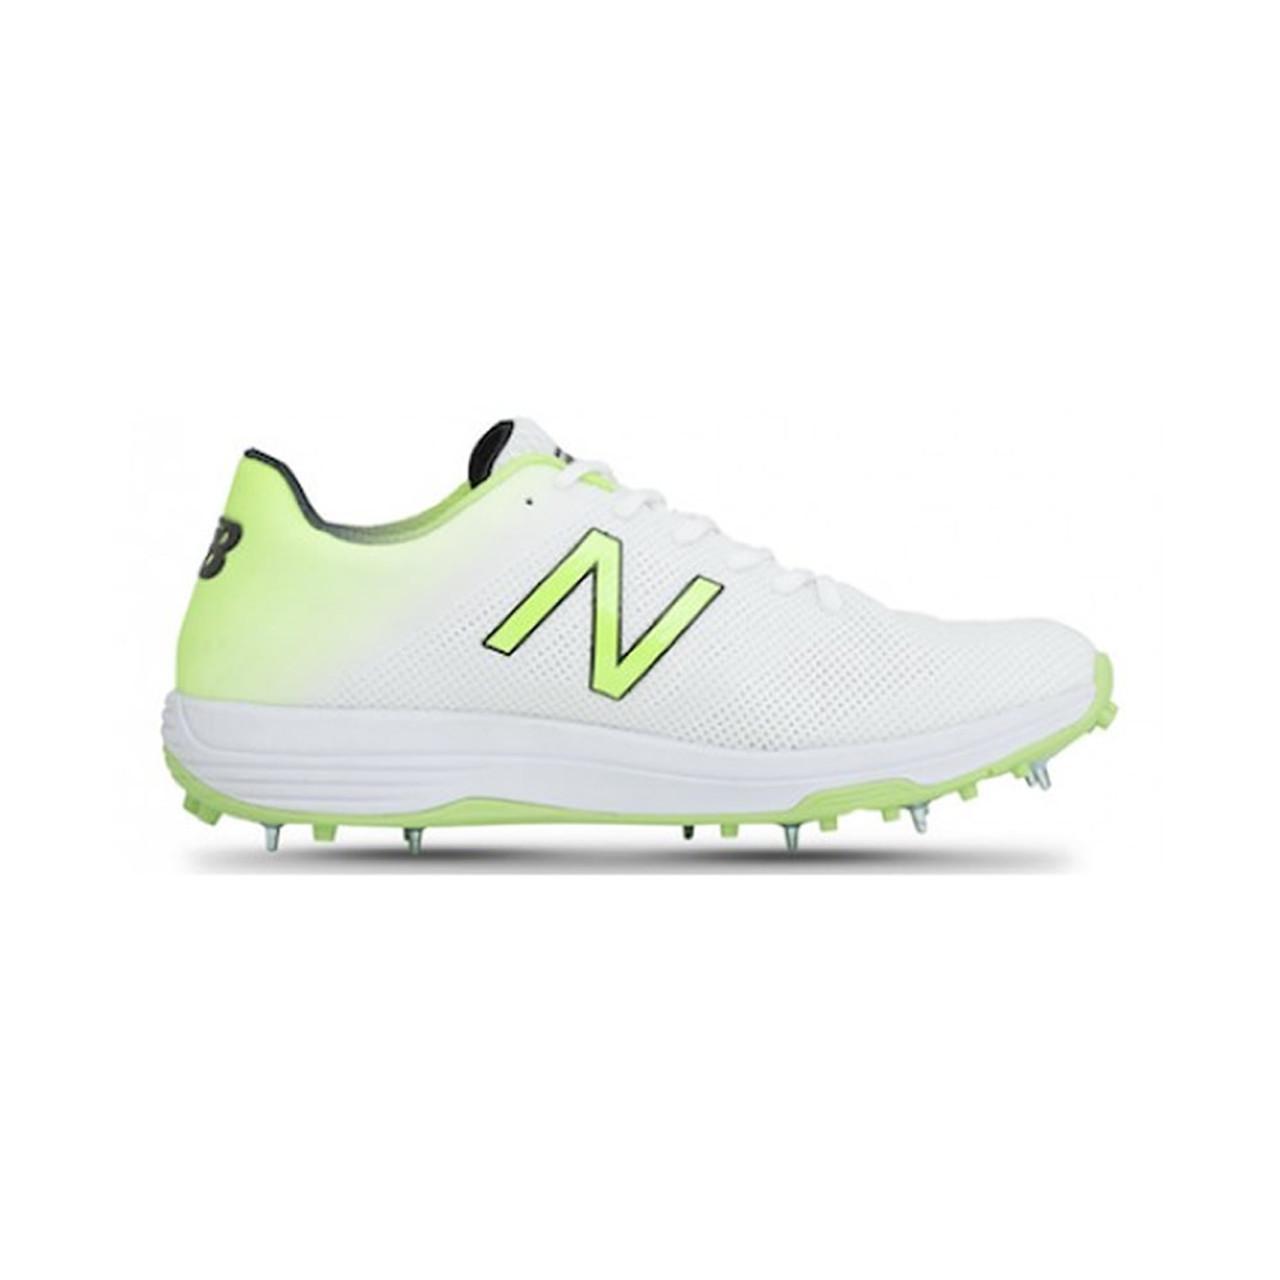 New Balance Cricket Shoes CK10L3